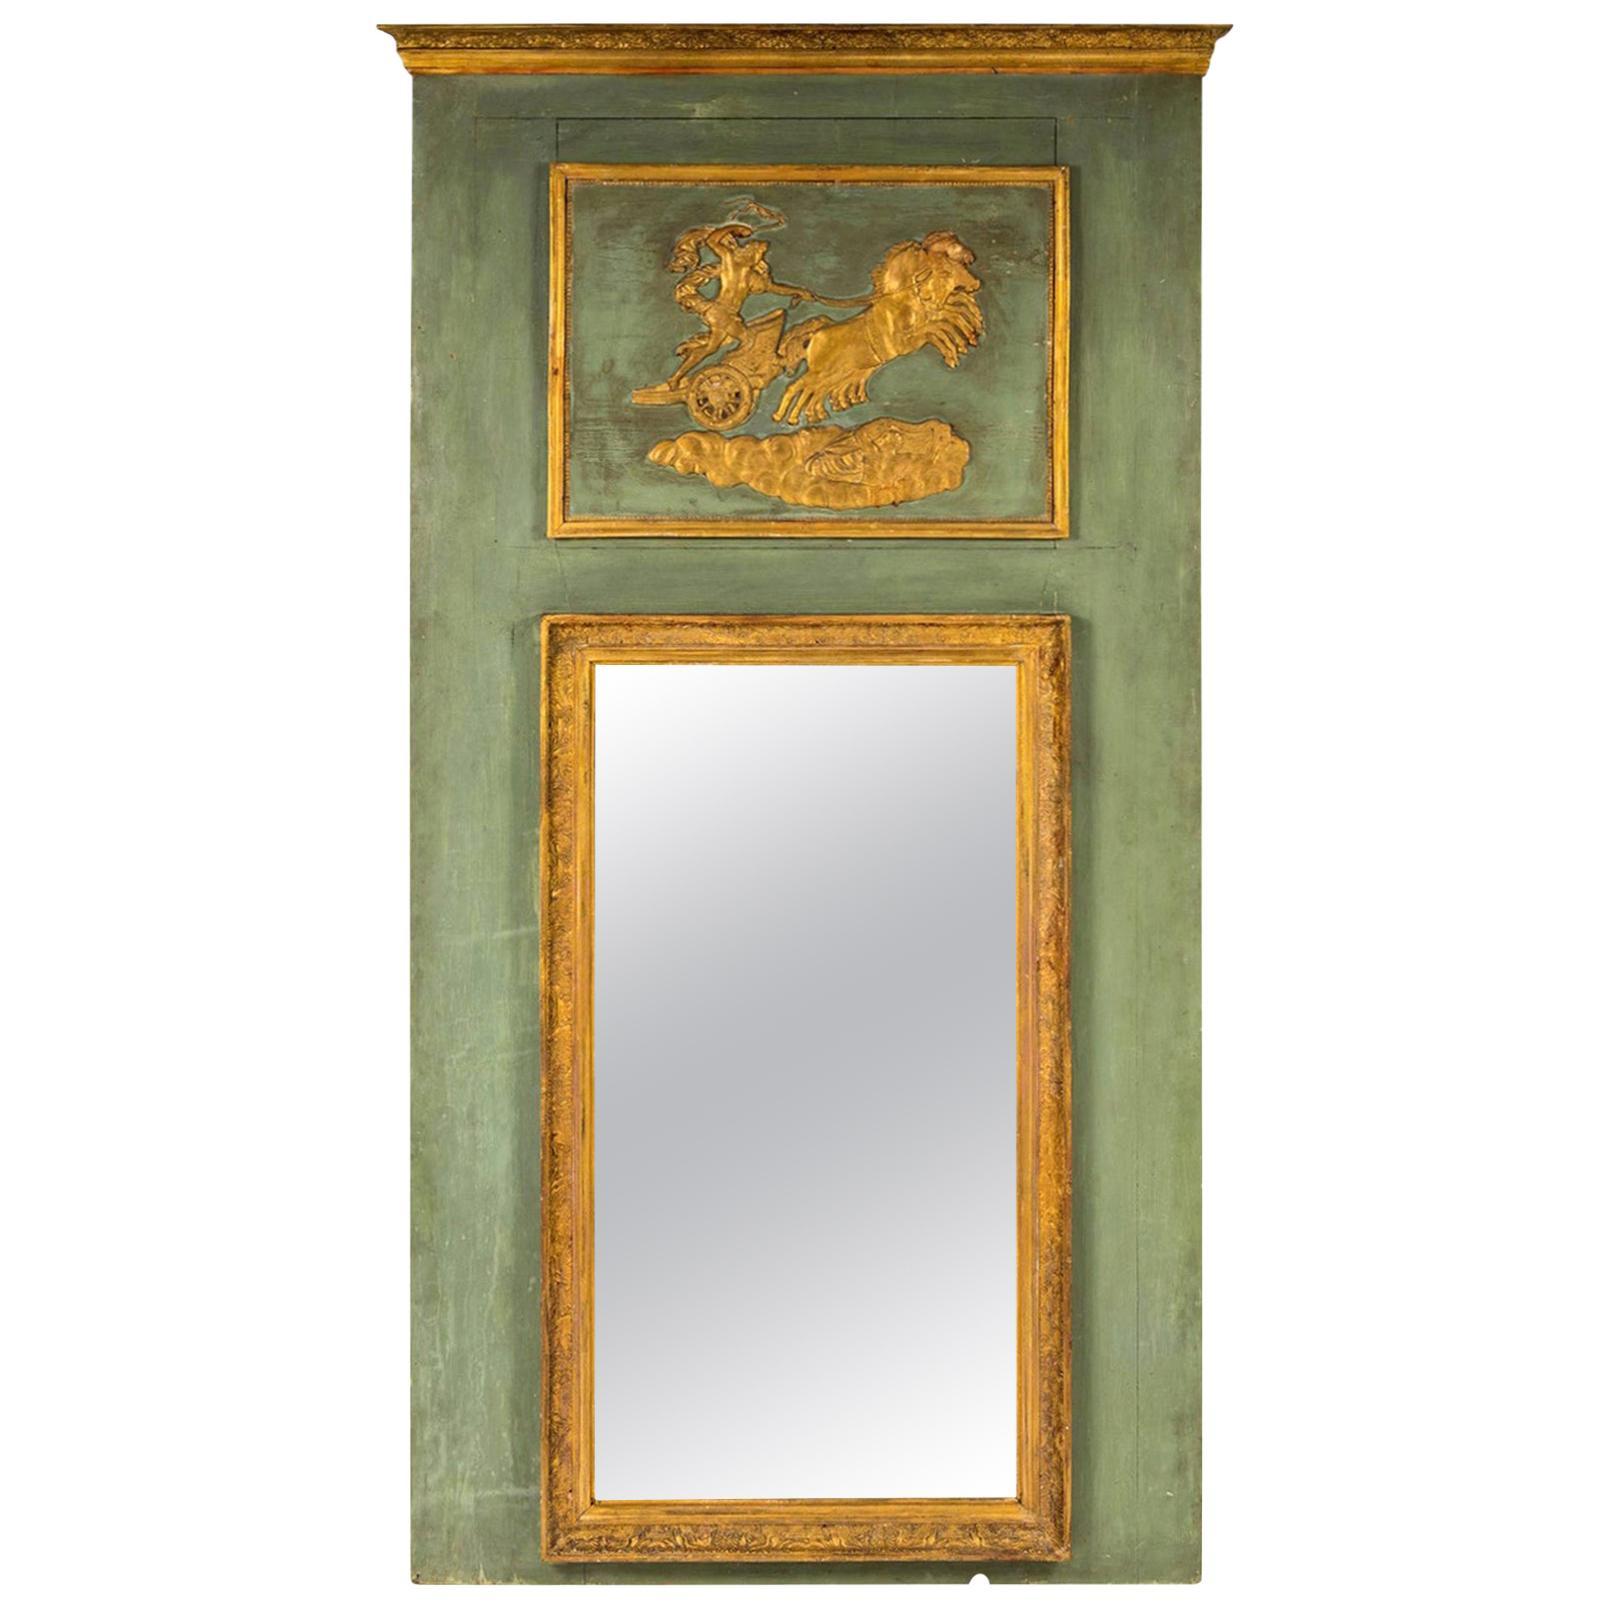 Early 19th Century Empire Trumeau Mirror